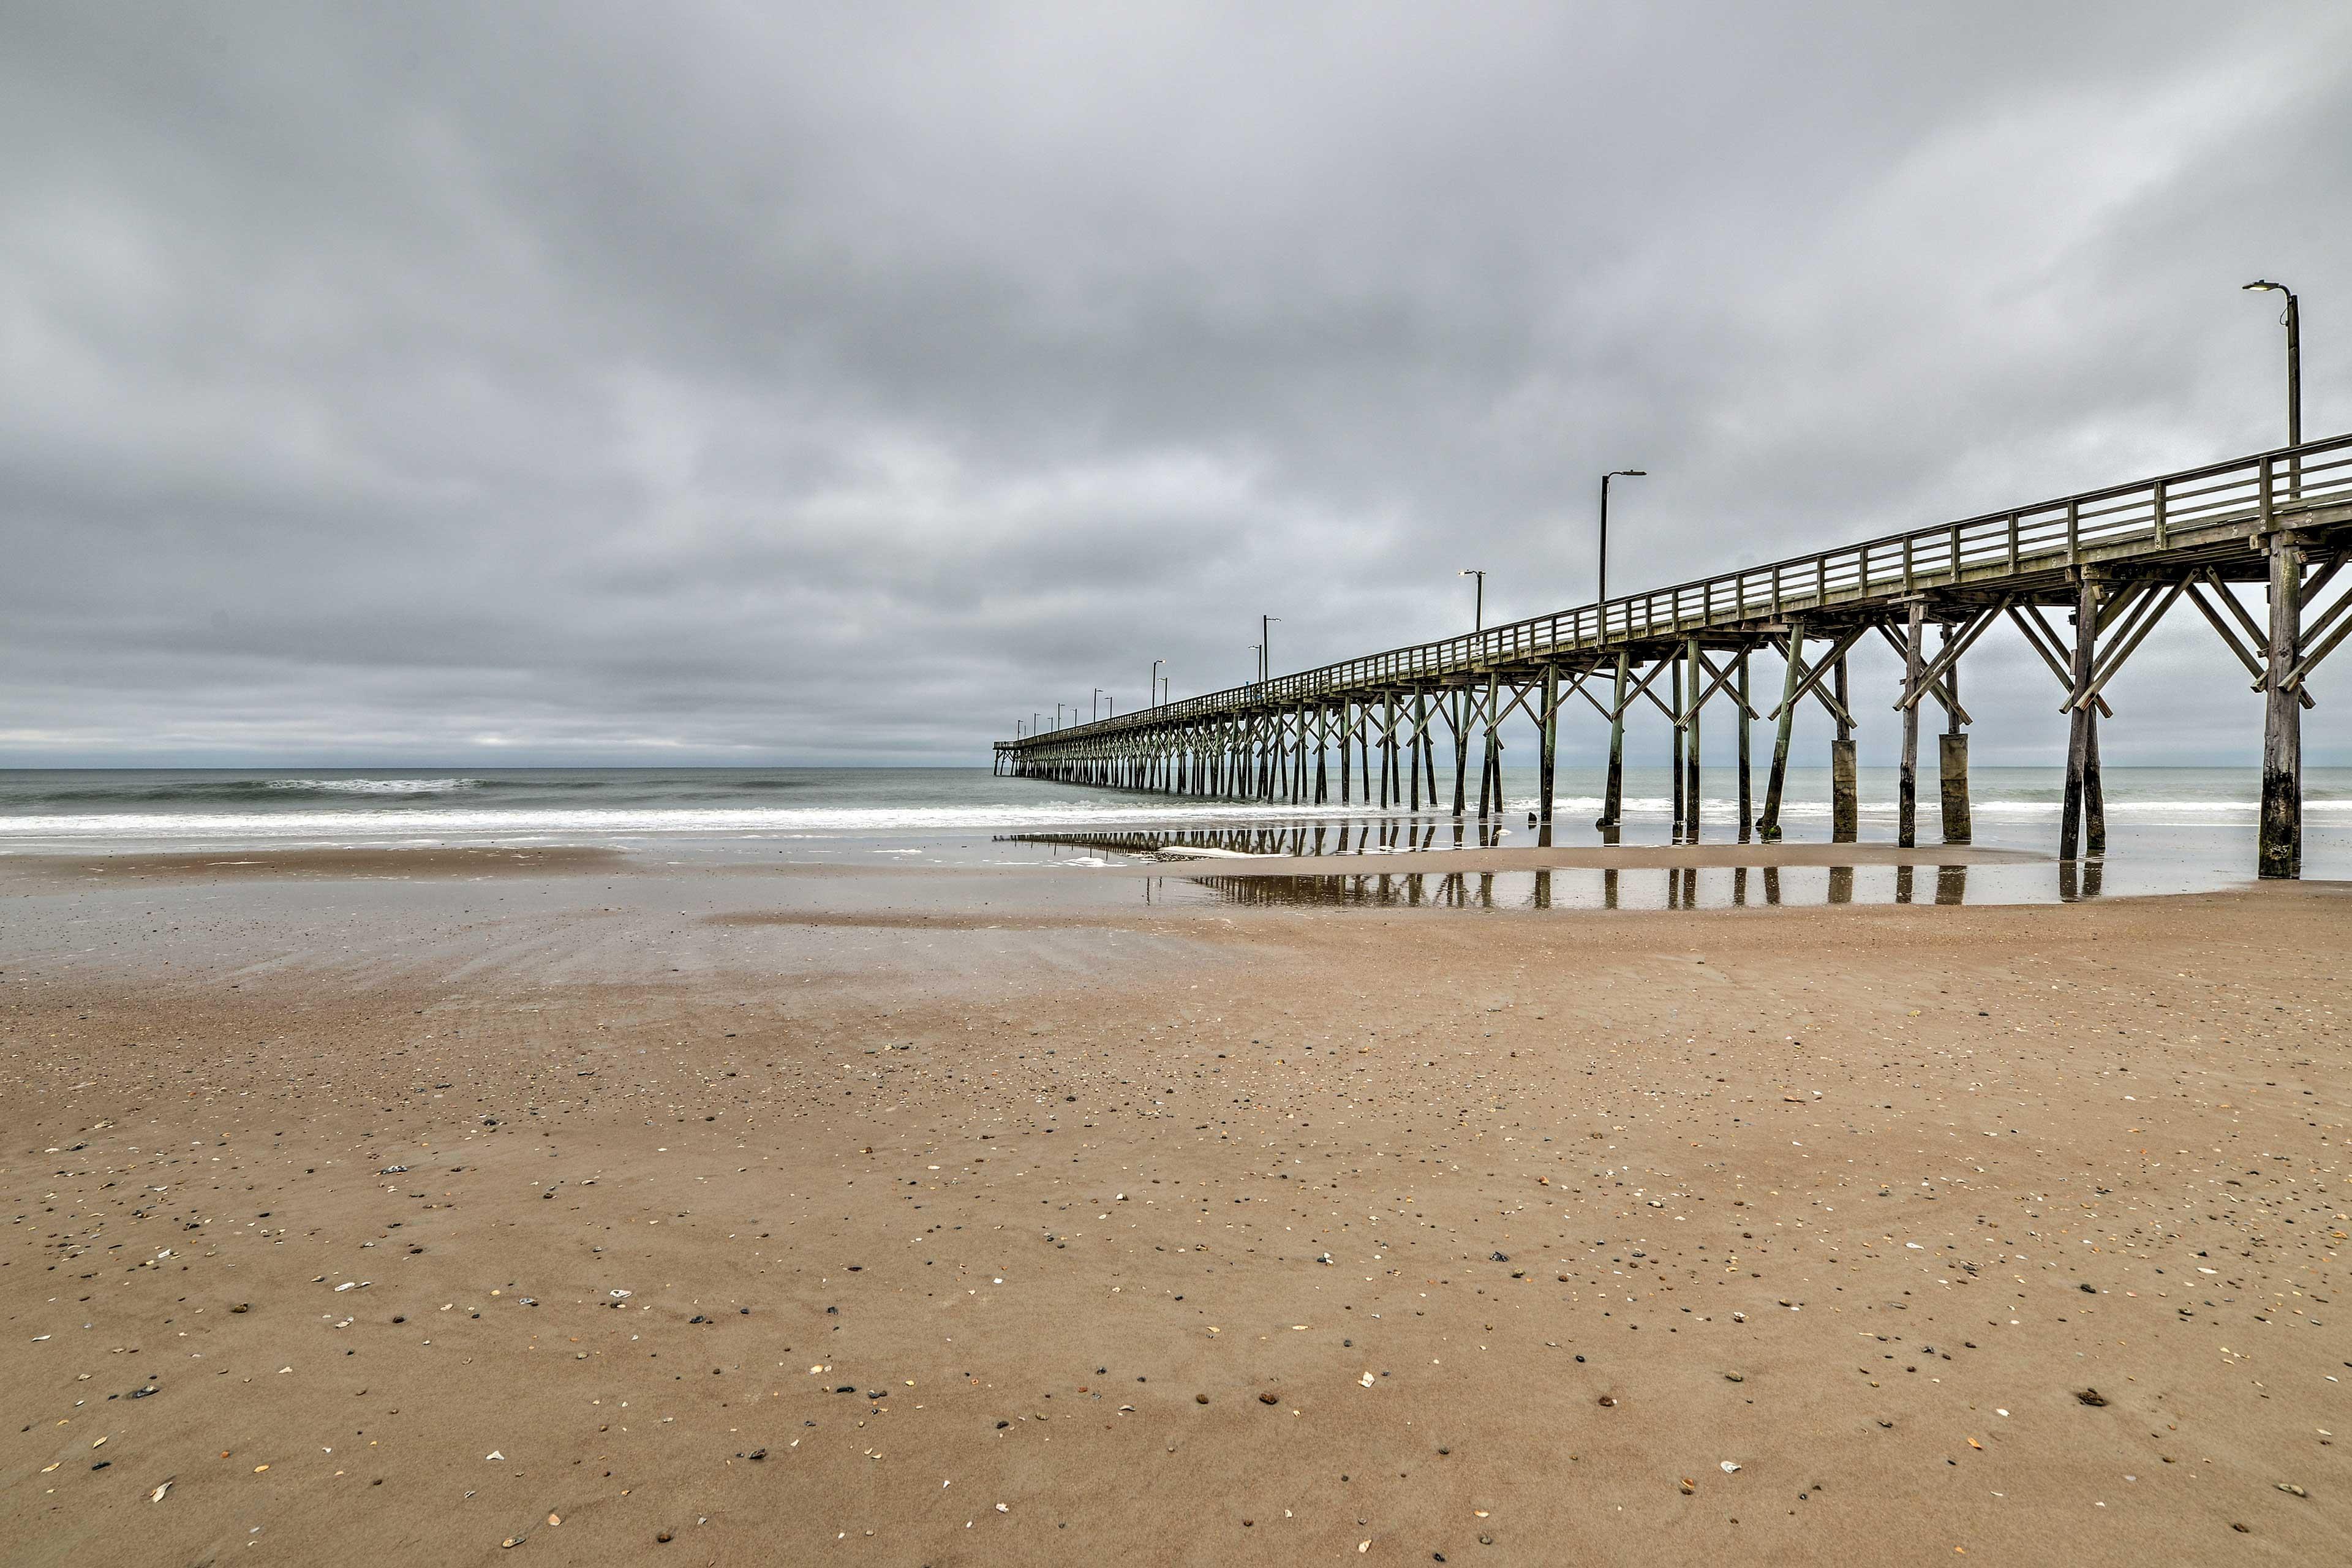 Take a walk to the pier.